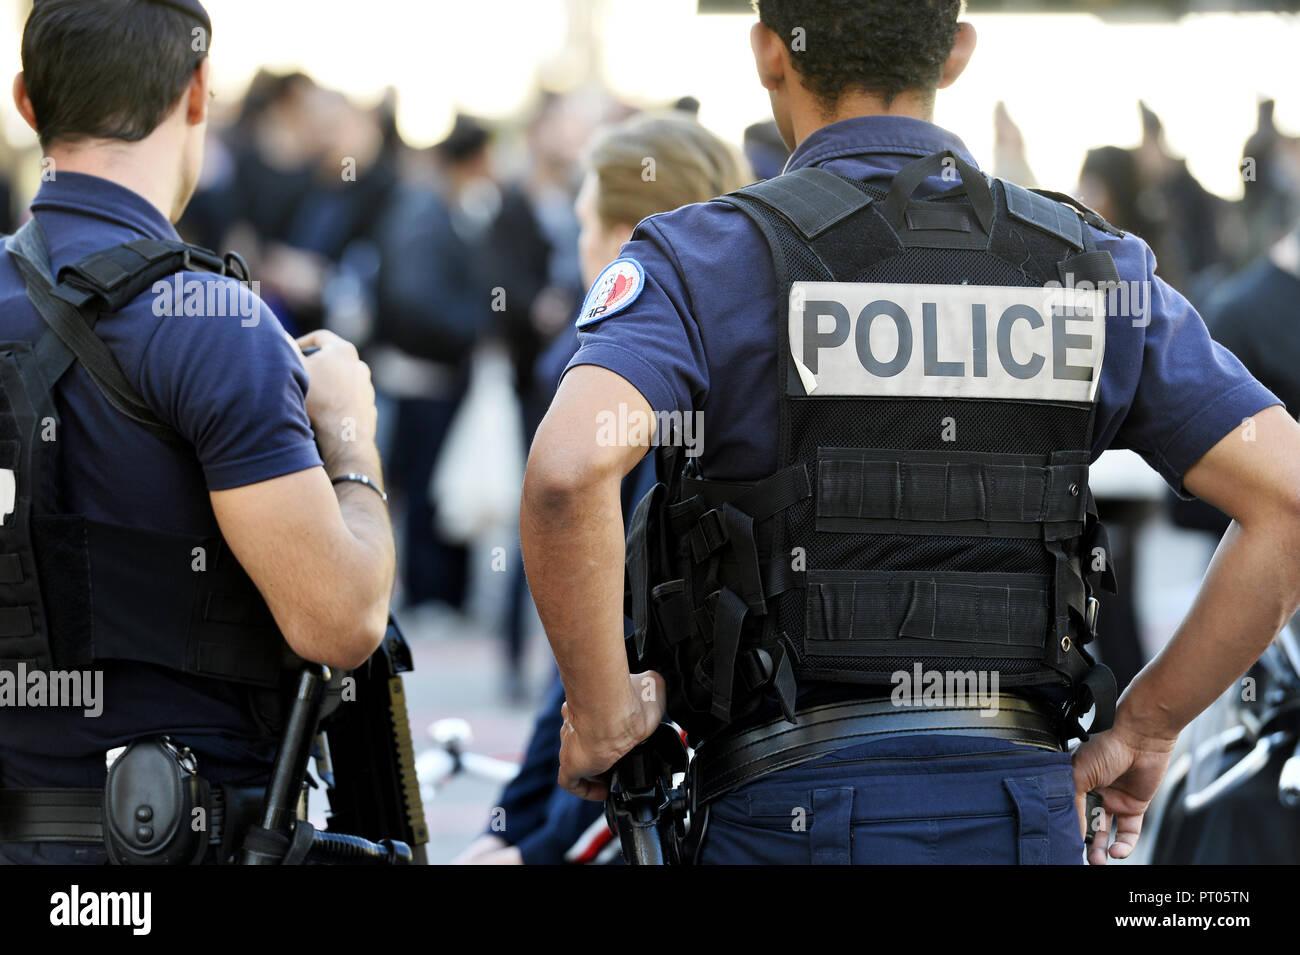 Police officers with bulletproof vest in Paris Street - Paris - France - Stock Image